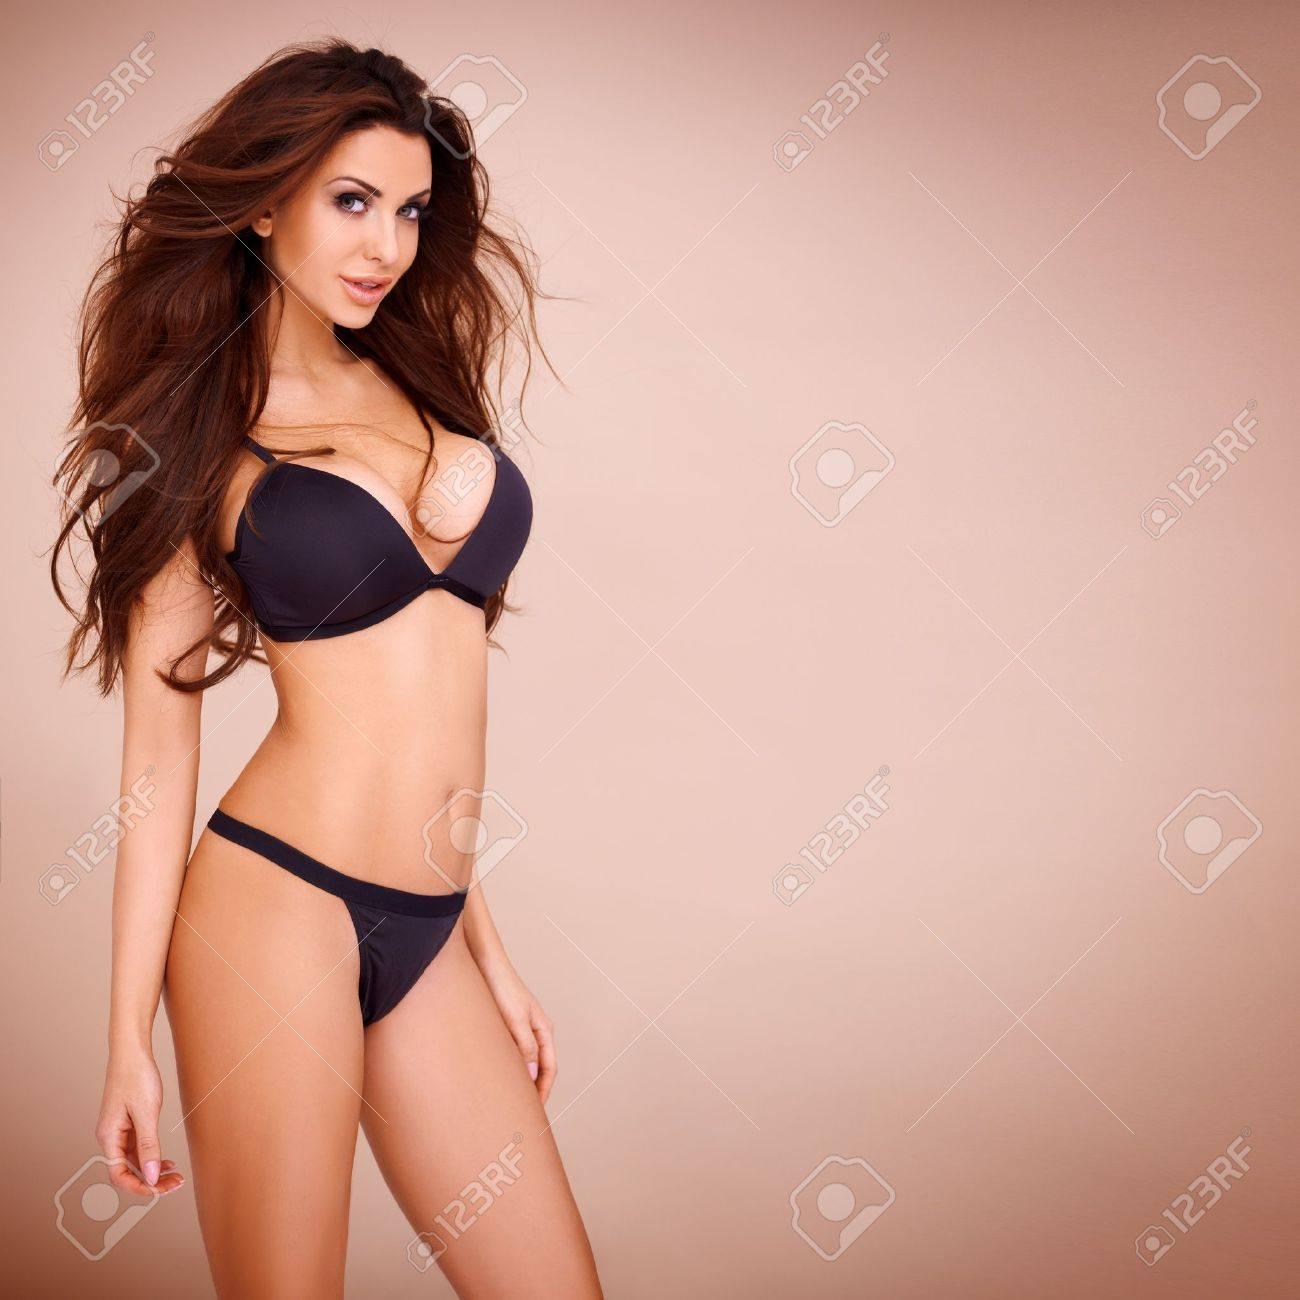 Sexy virgins girls gallery